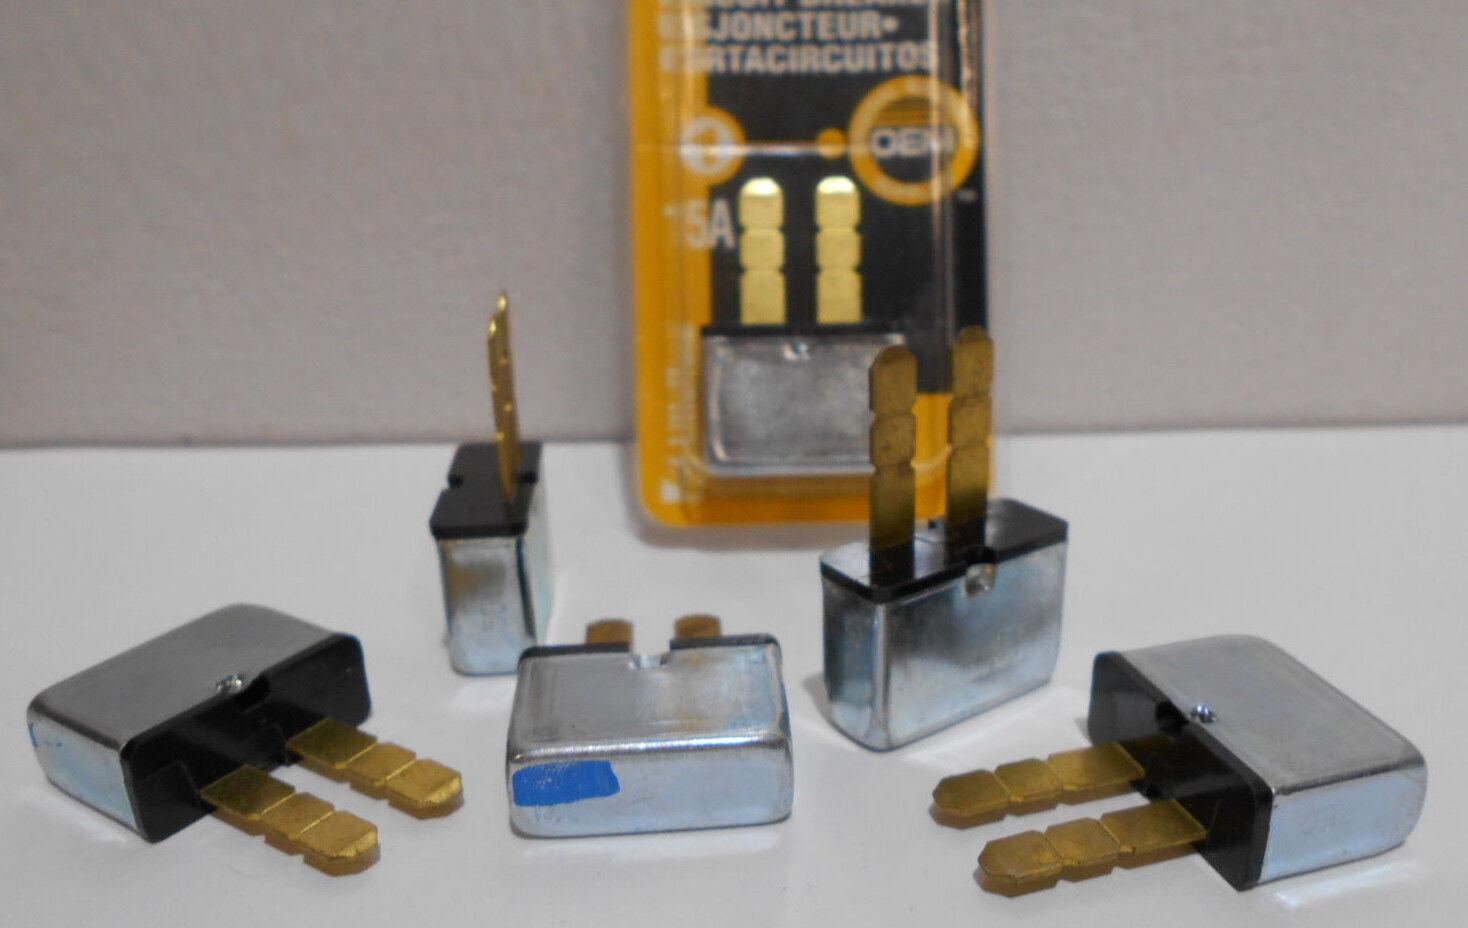 12 Volt Circuit Breakers